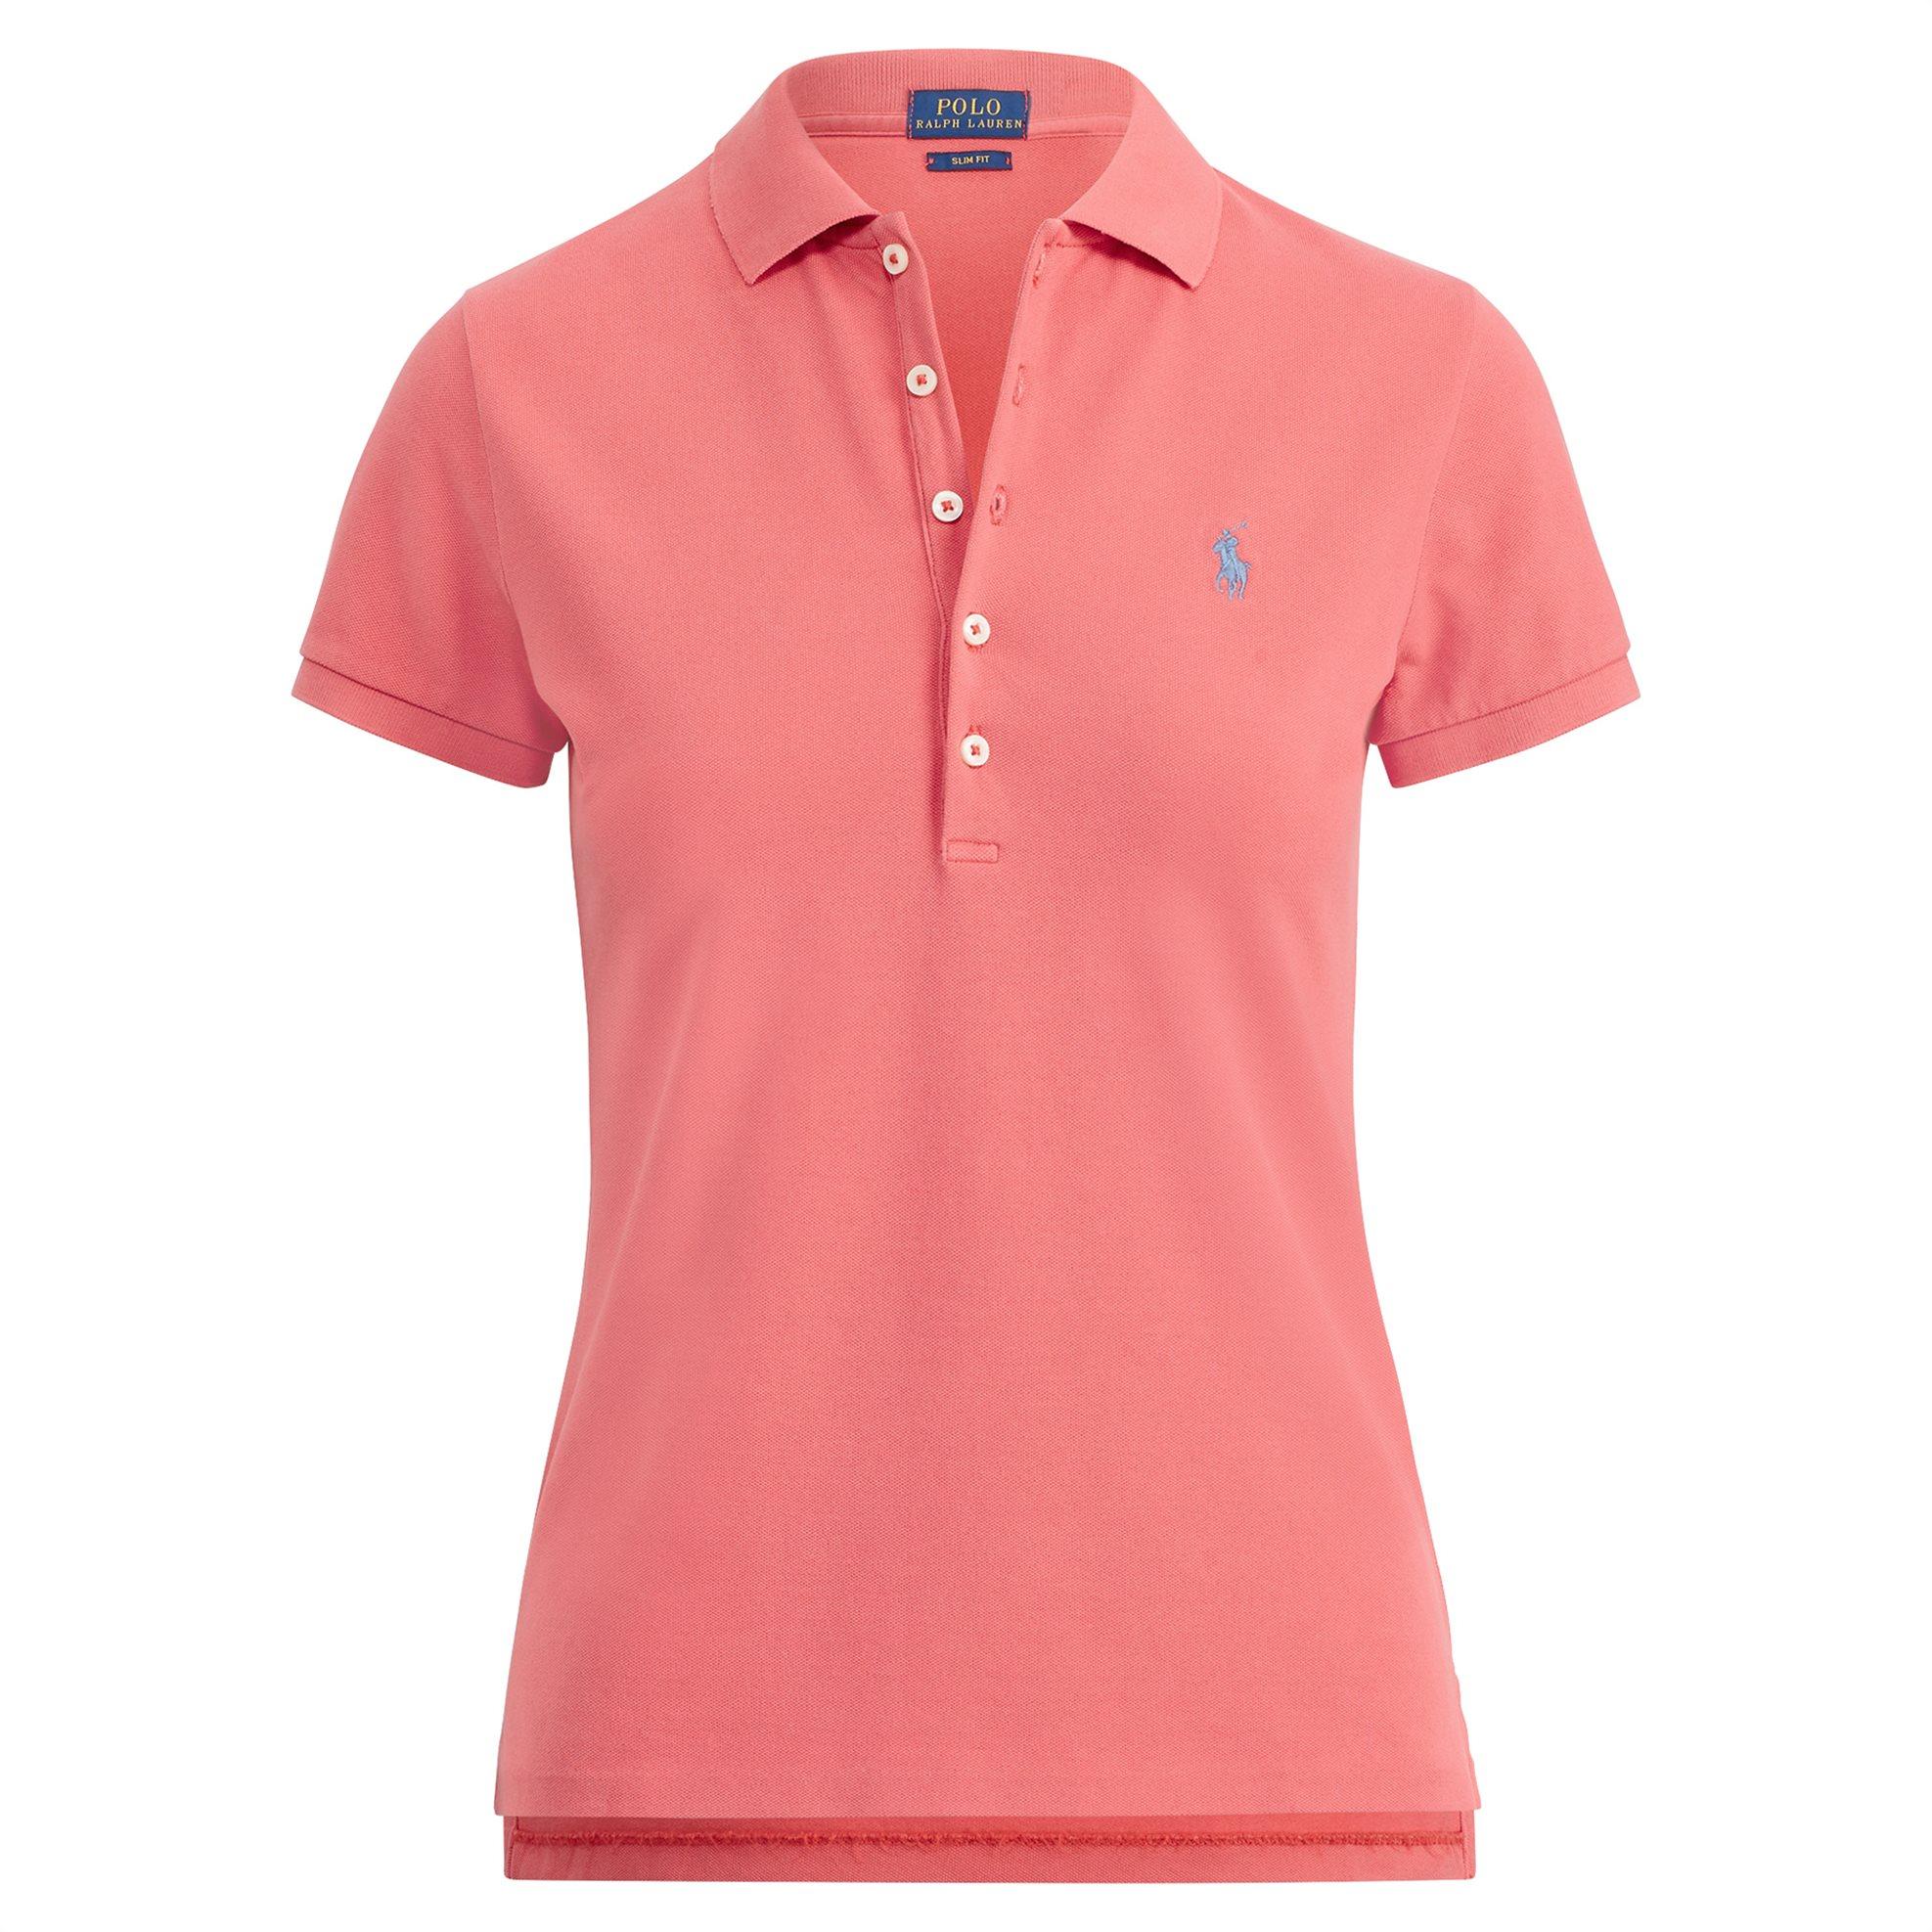 Polo Ralph Lauren γυναικεία μπλούζα Slim Fit Polo Shirt - 211505654124 - Κοραλί γυναικα   ρουχα   tops   μπλούζες   πόλο